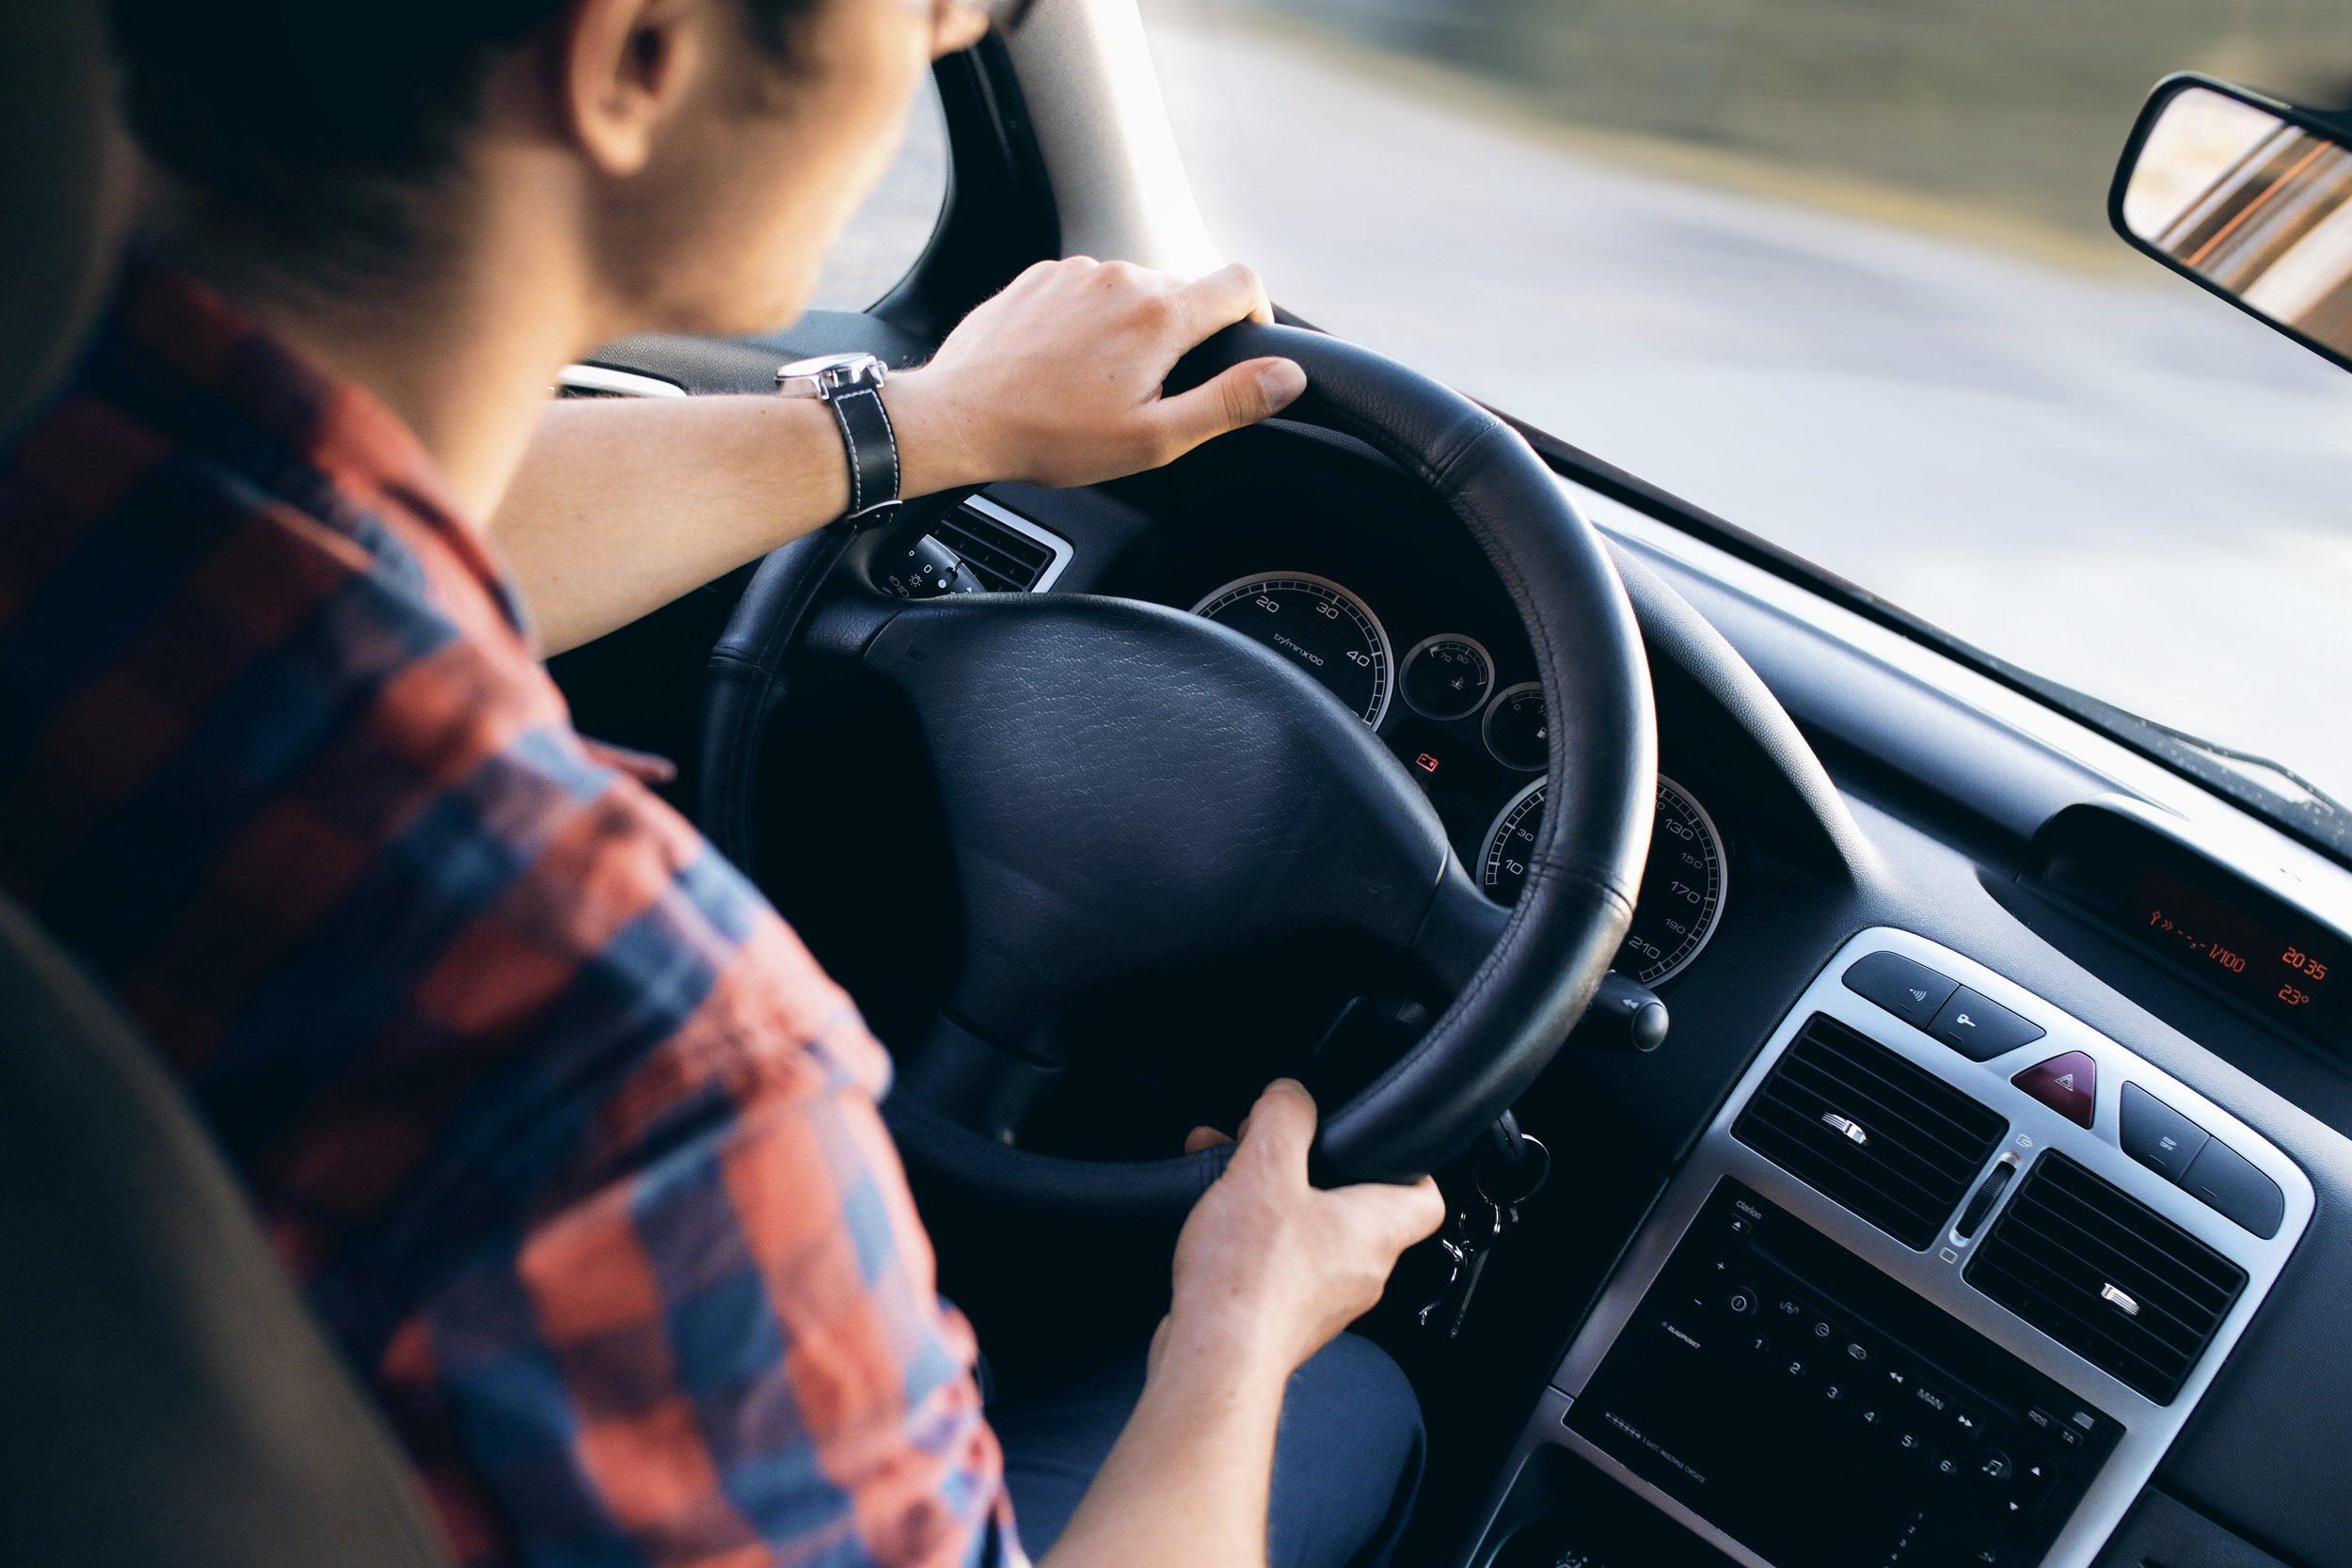 adult-automotive-blur-13861 (1).jpg